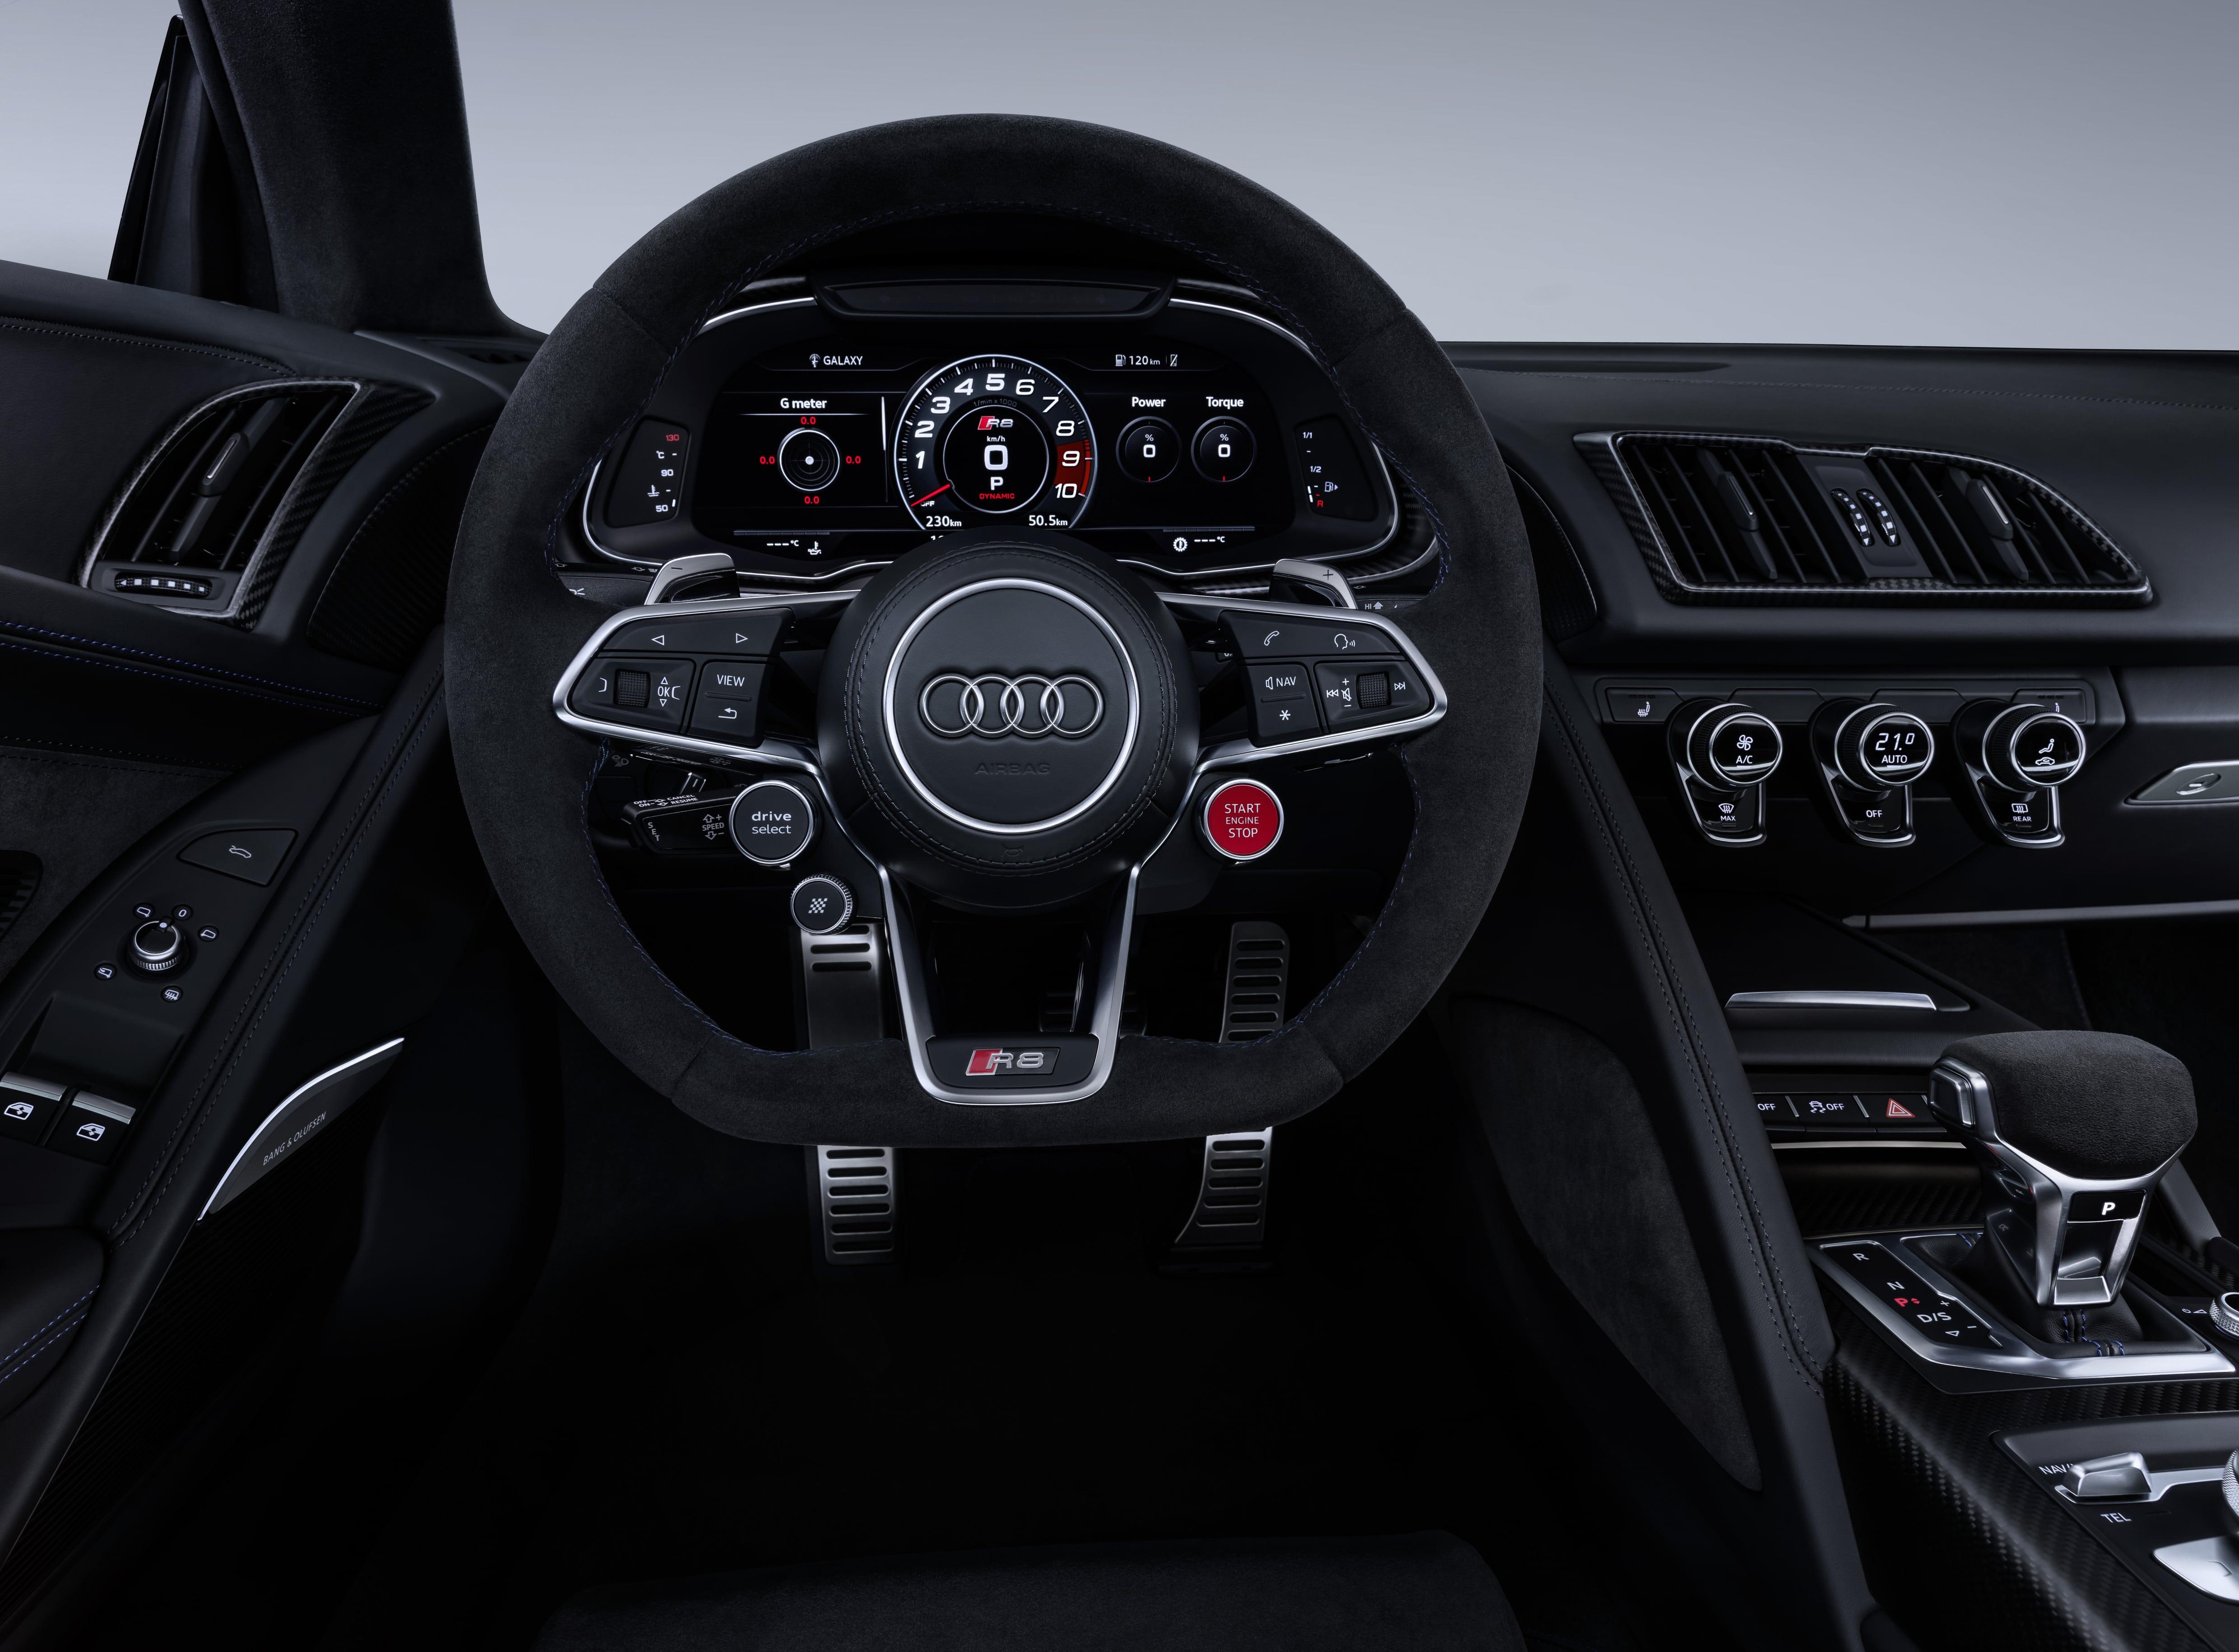 audi r8 audi r8 Audi R8 2019: design aggressivo e performance superiori a1812845 large